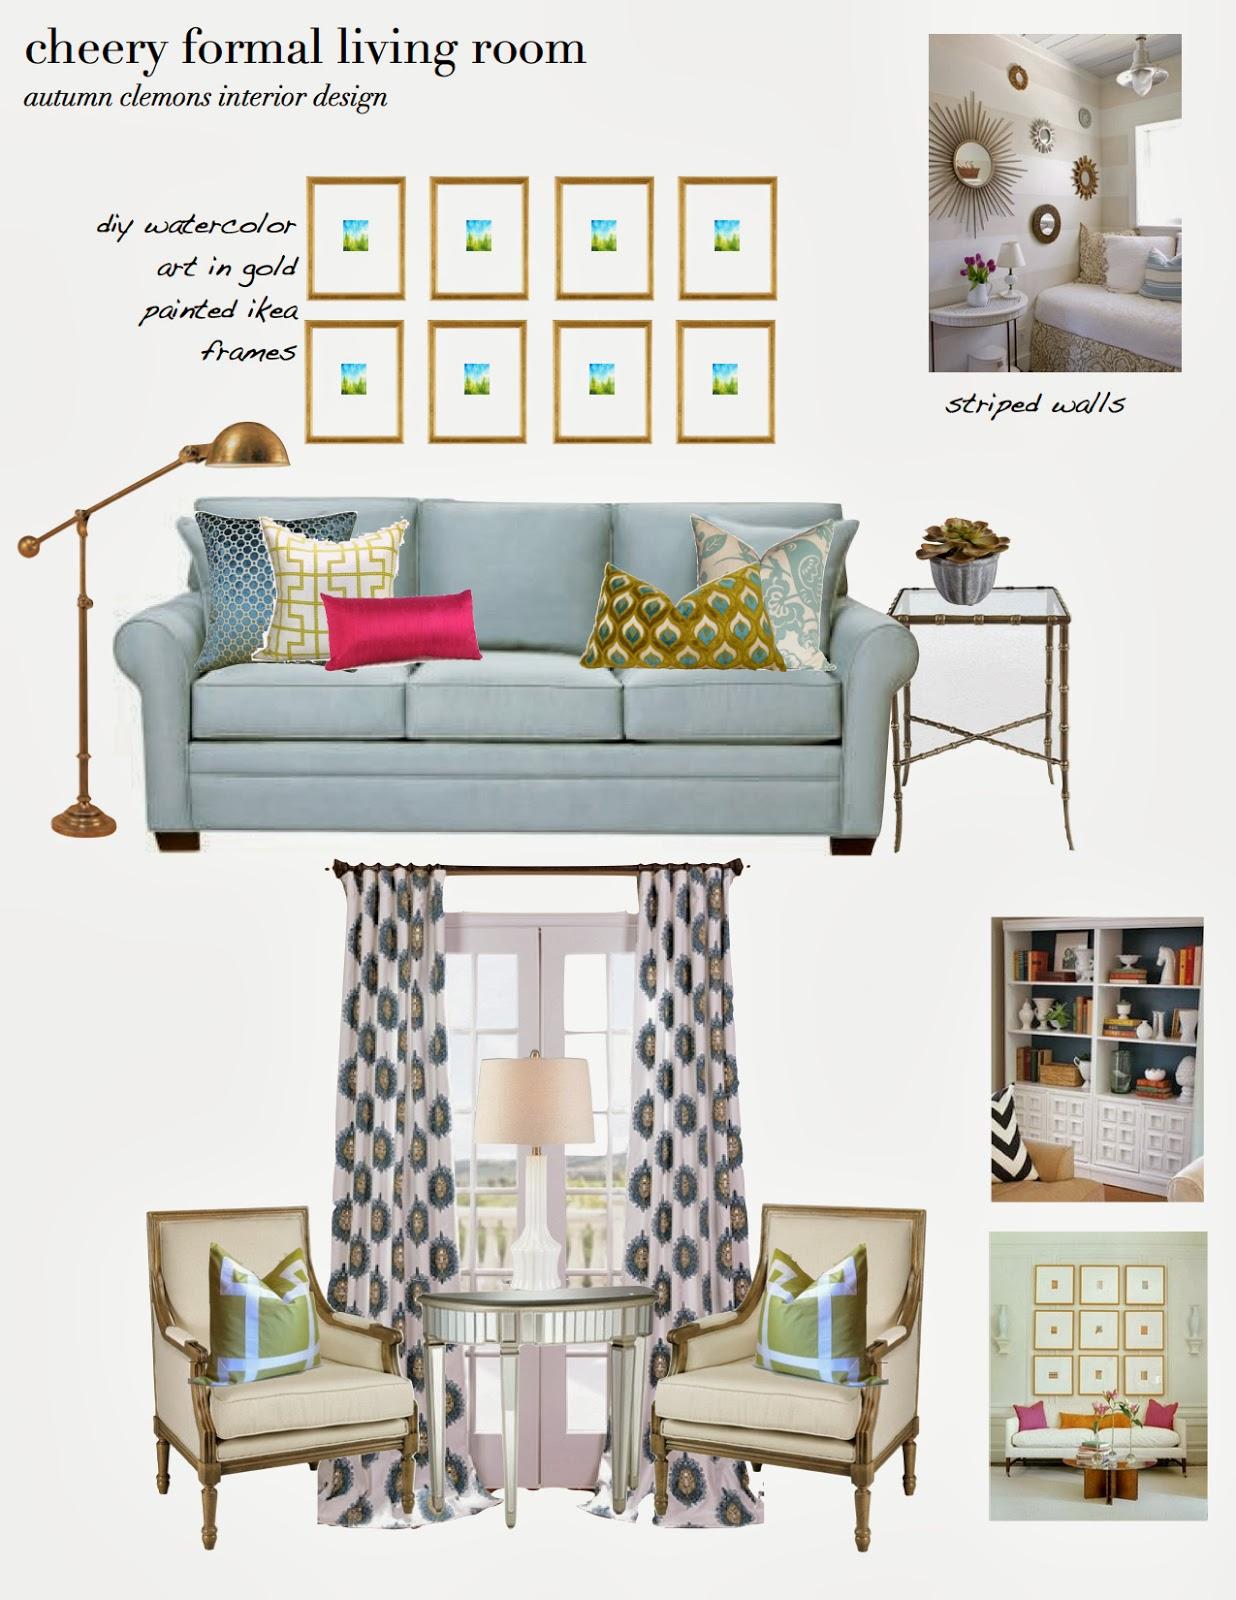 Design dump design plan cheery formal living room - Living room layout planner ...